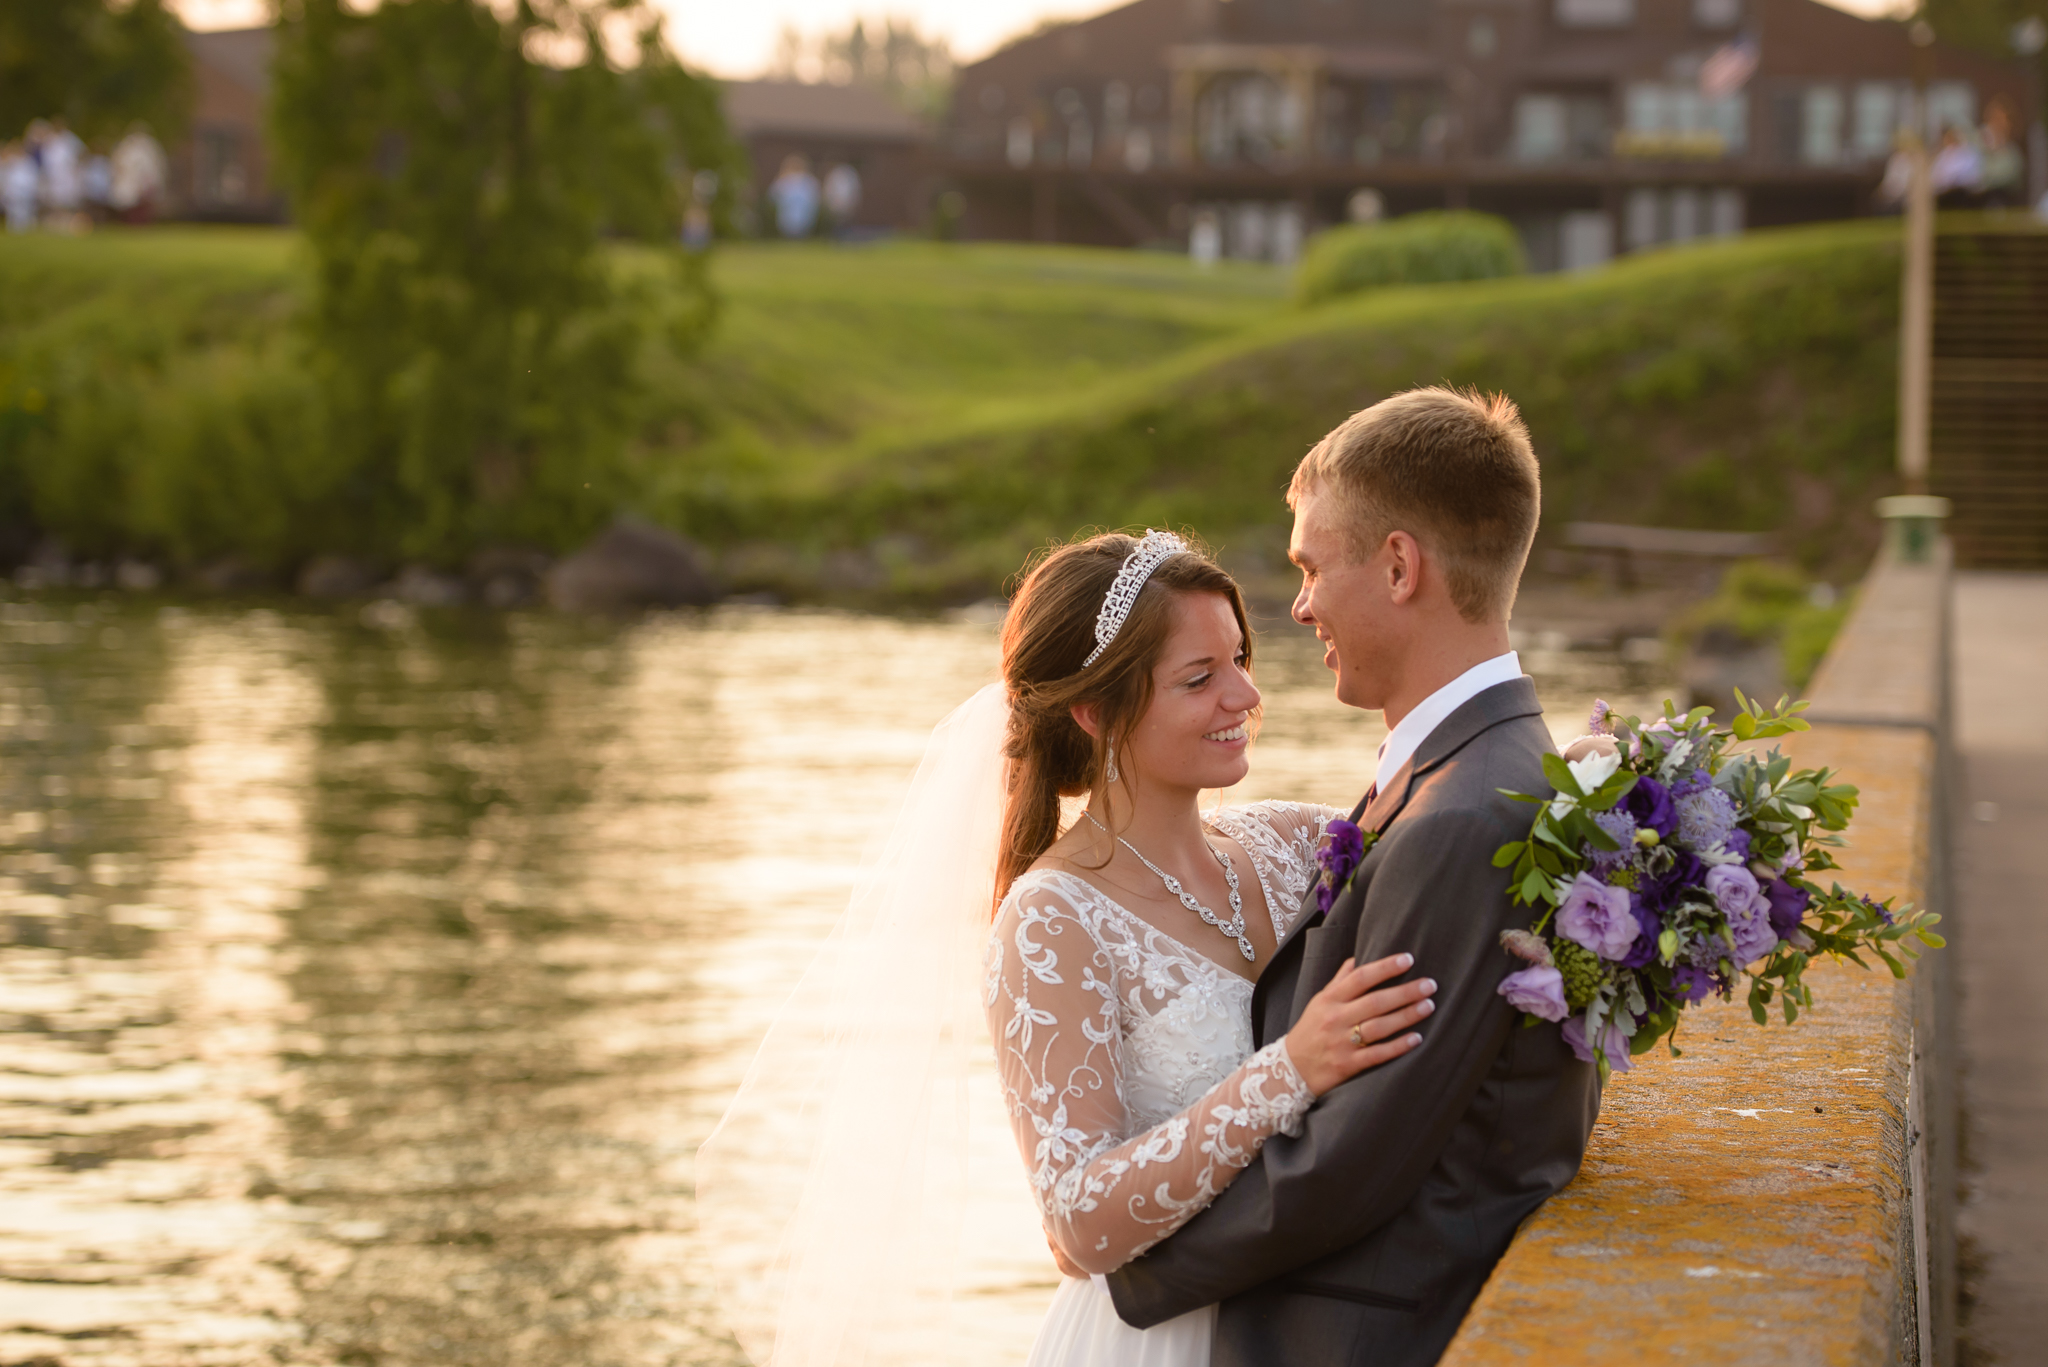 44-ashland washburn wedding photographyDSC_5944.jpg